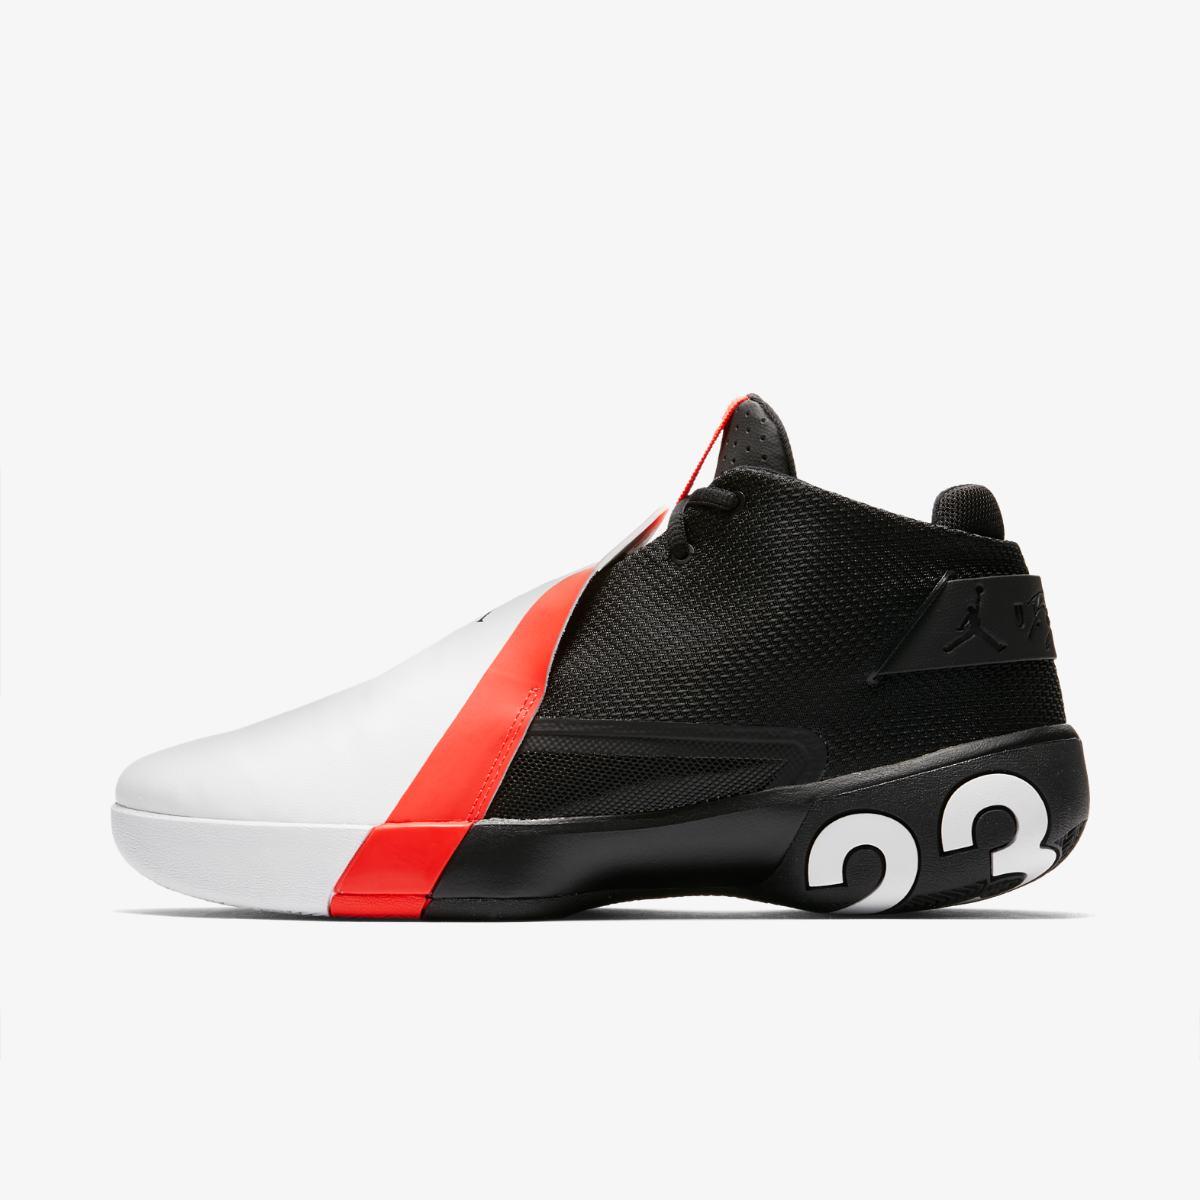 ece6b617 Кроссовки для баскетбола AIR JORDAN ULTRA FLY 3 BLACK INFRARED 23 WHITE ...